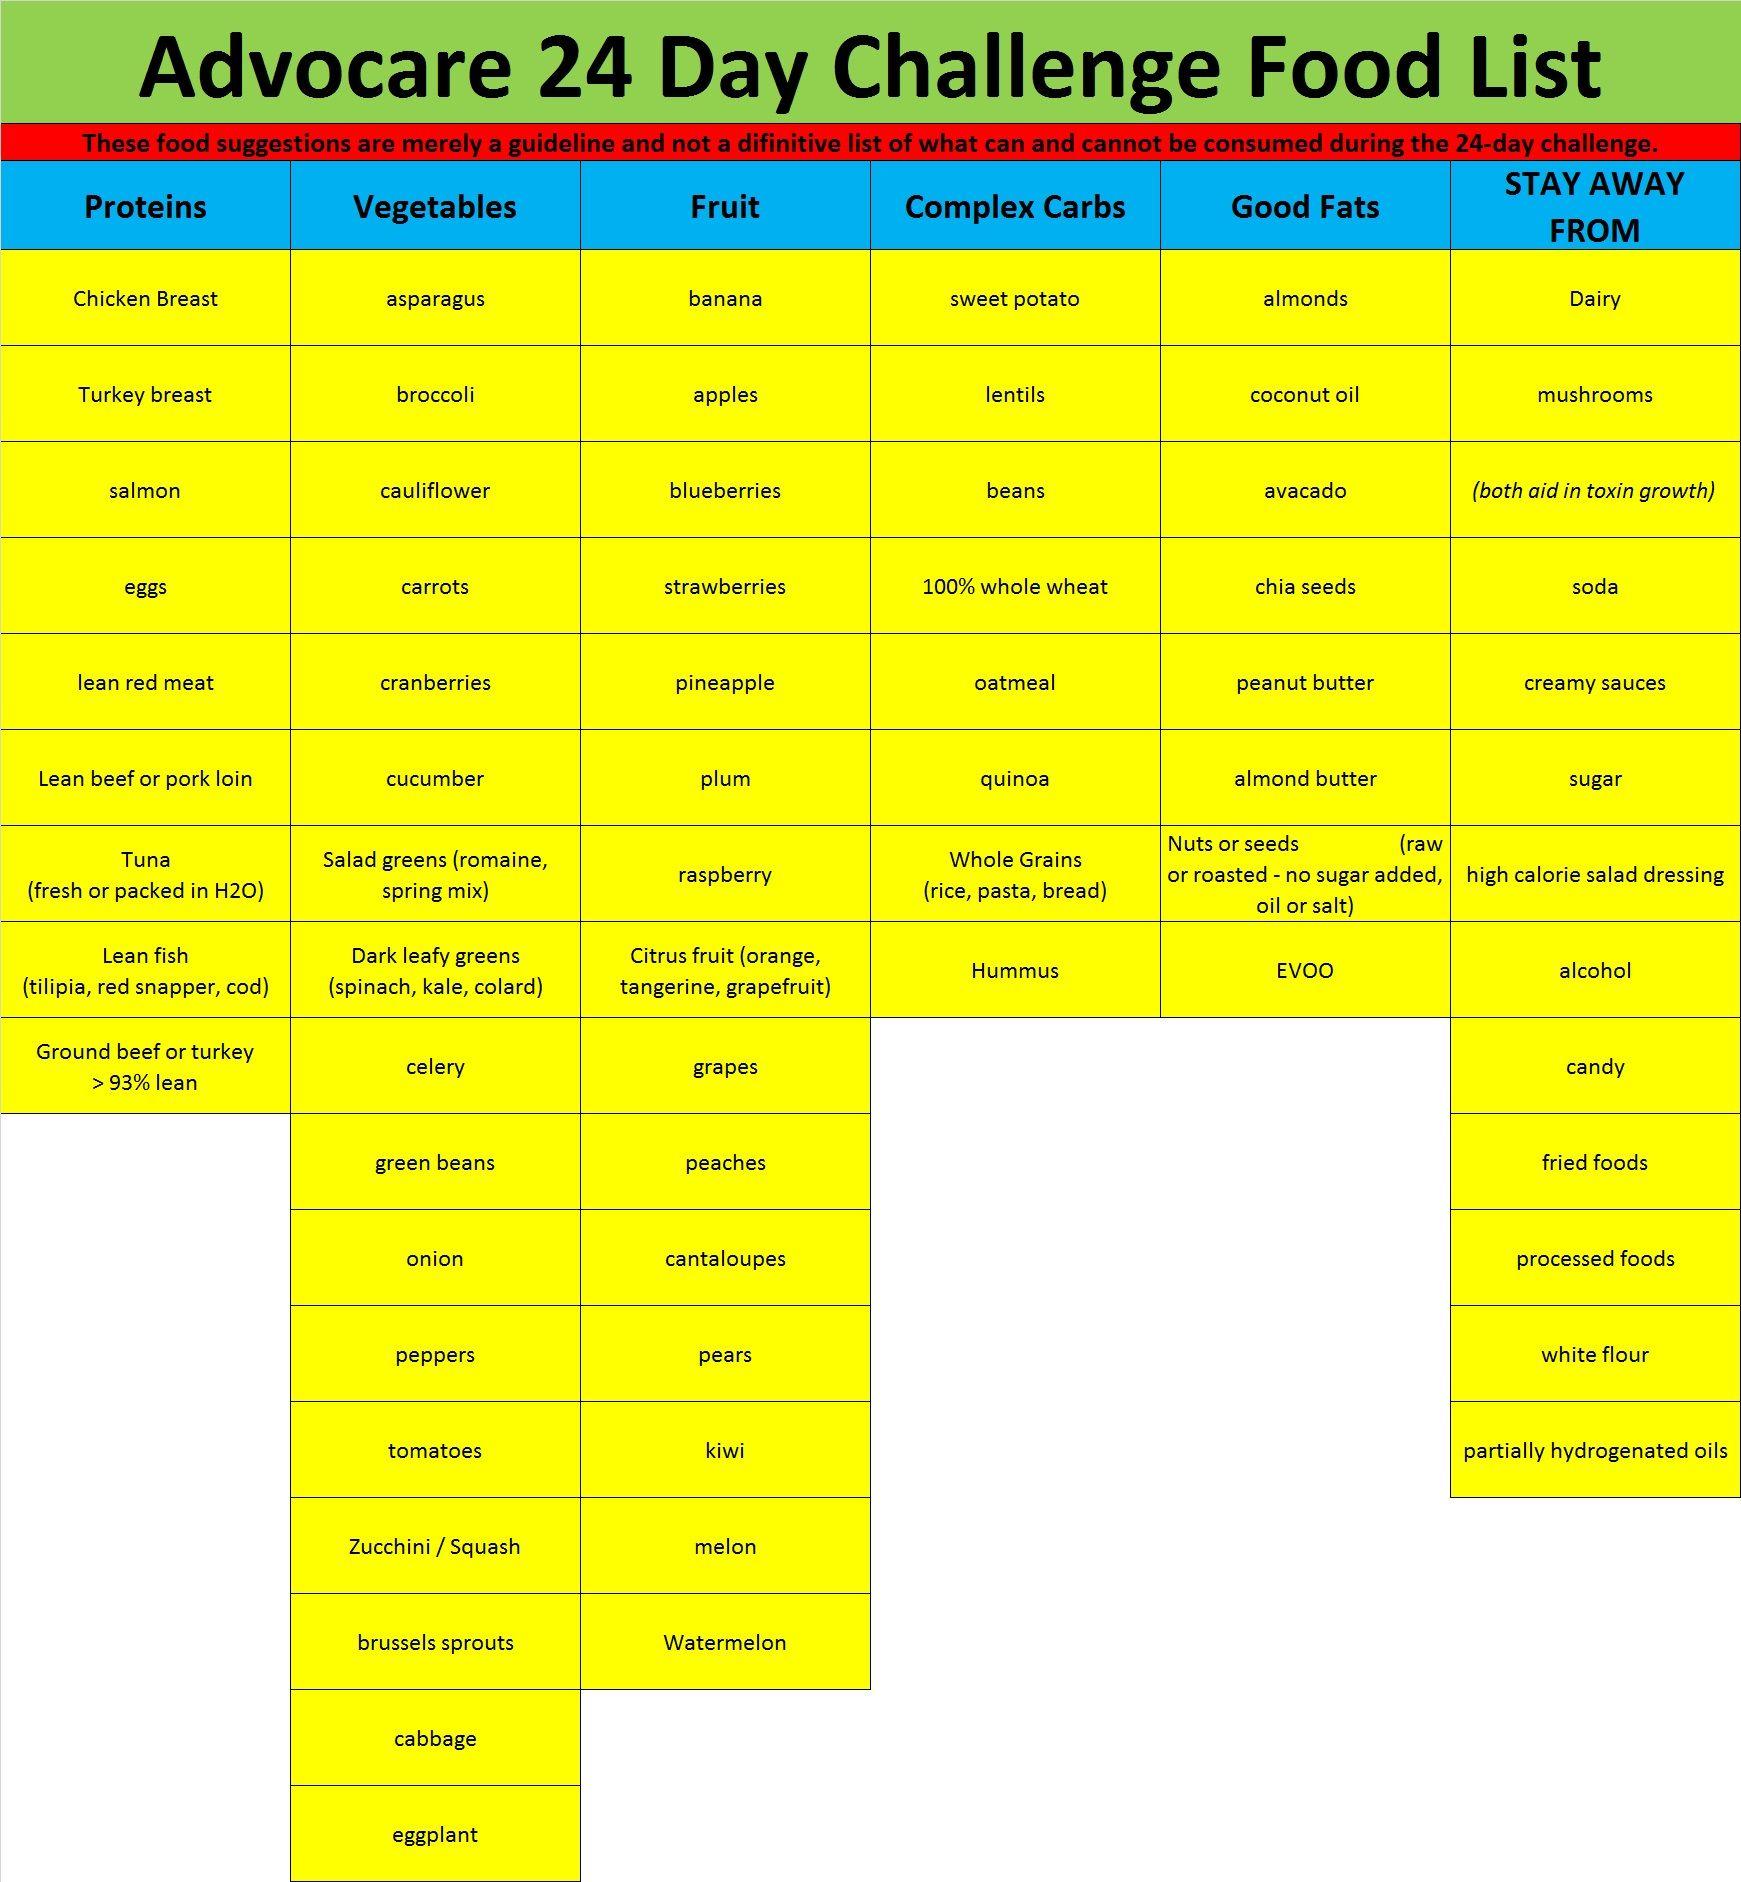 Food List For Advocare 24 Day Challenge | Advocare Cleanse Inside Advocare 24 Day Challenge Calendar